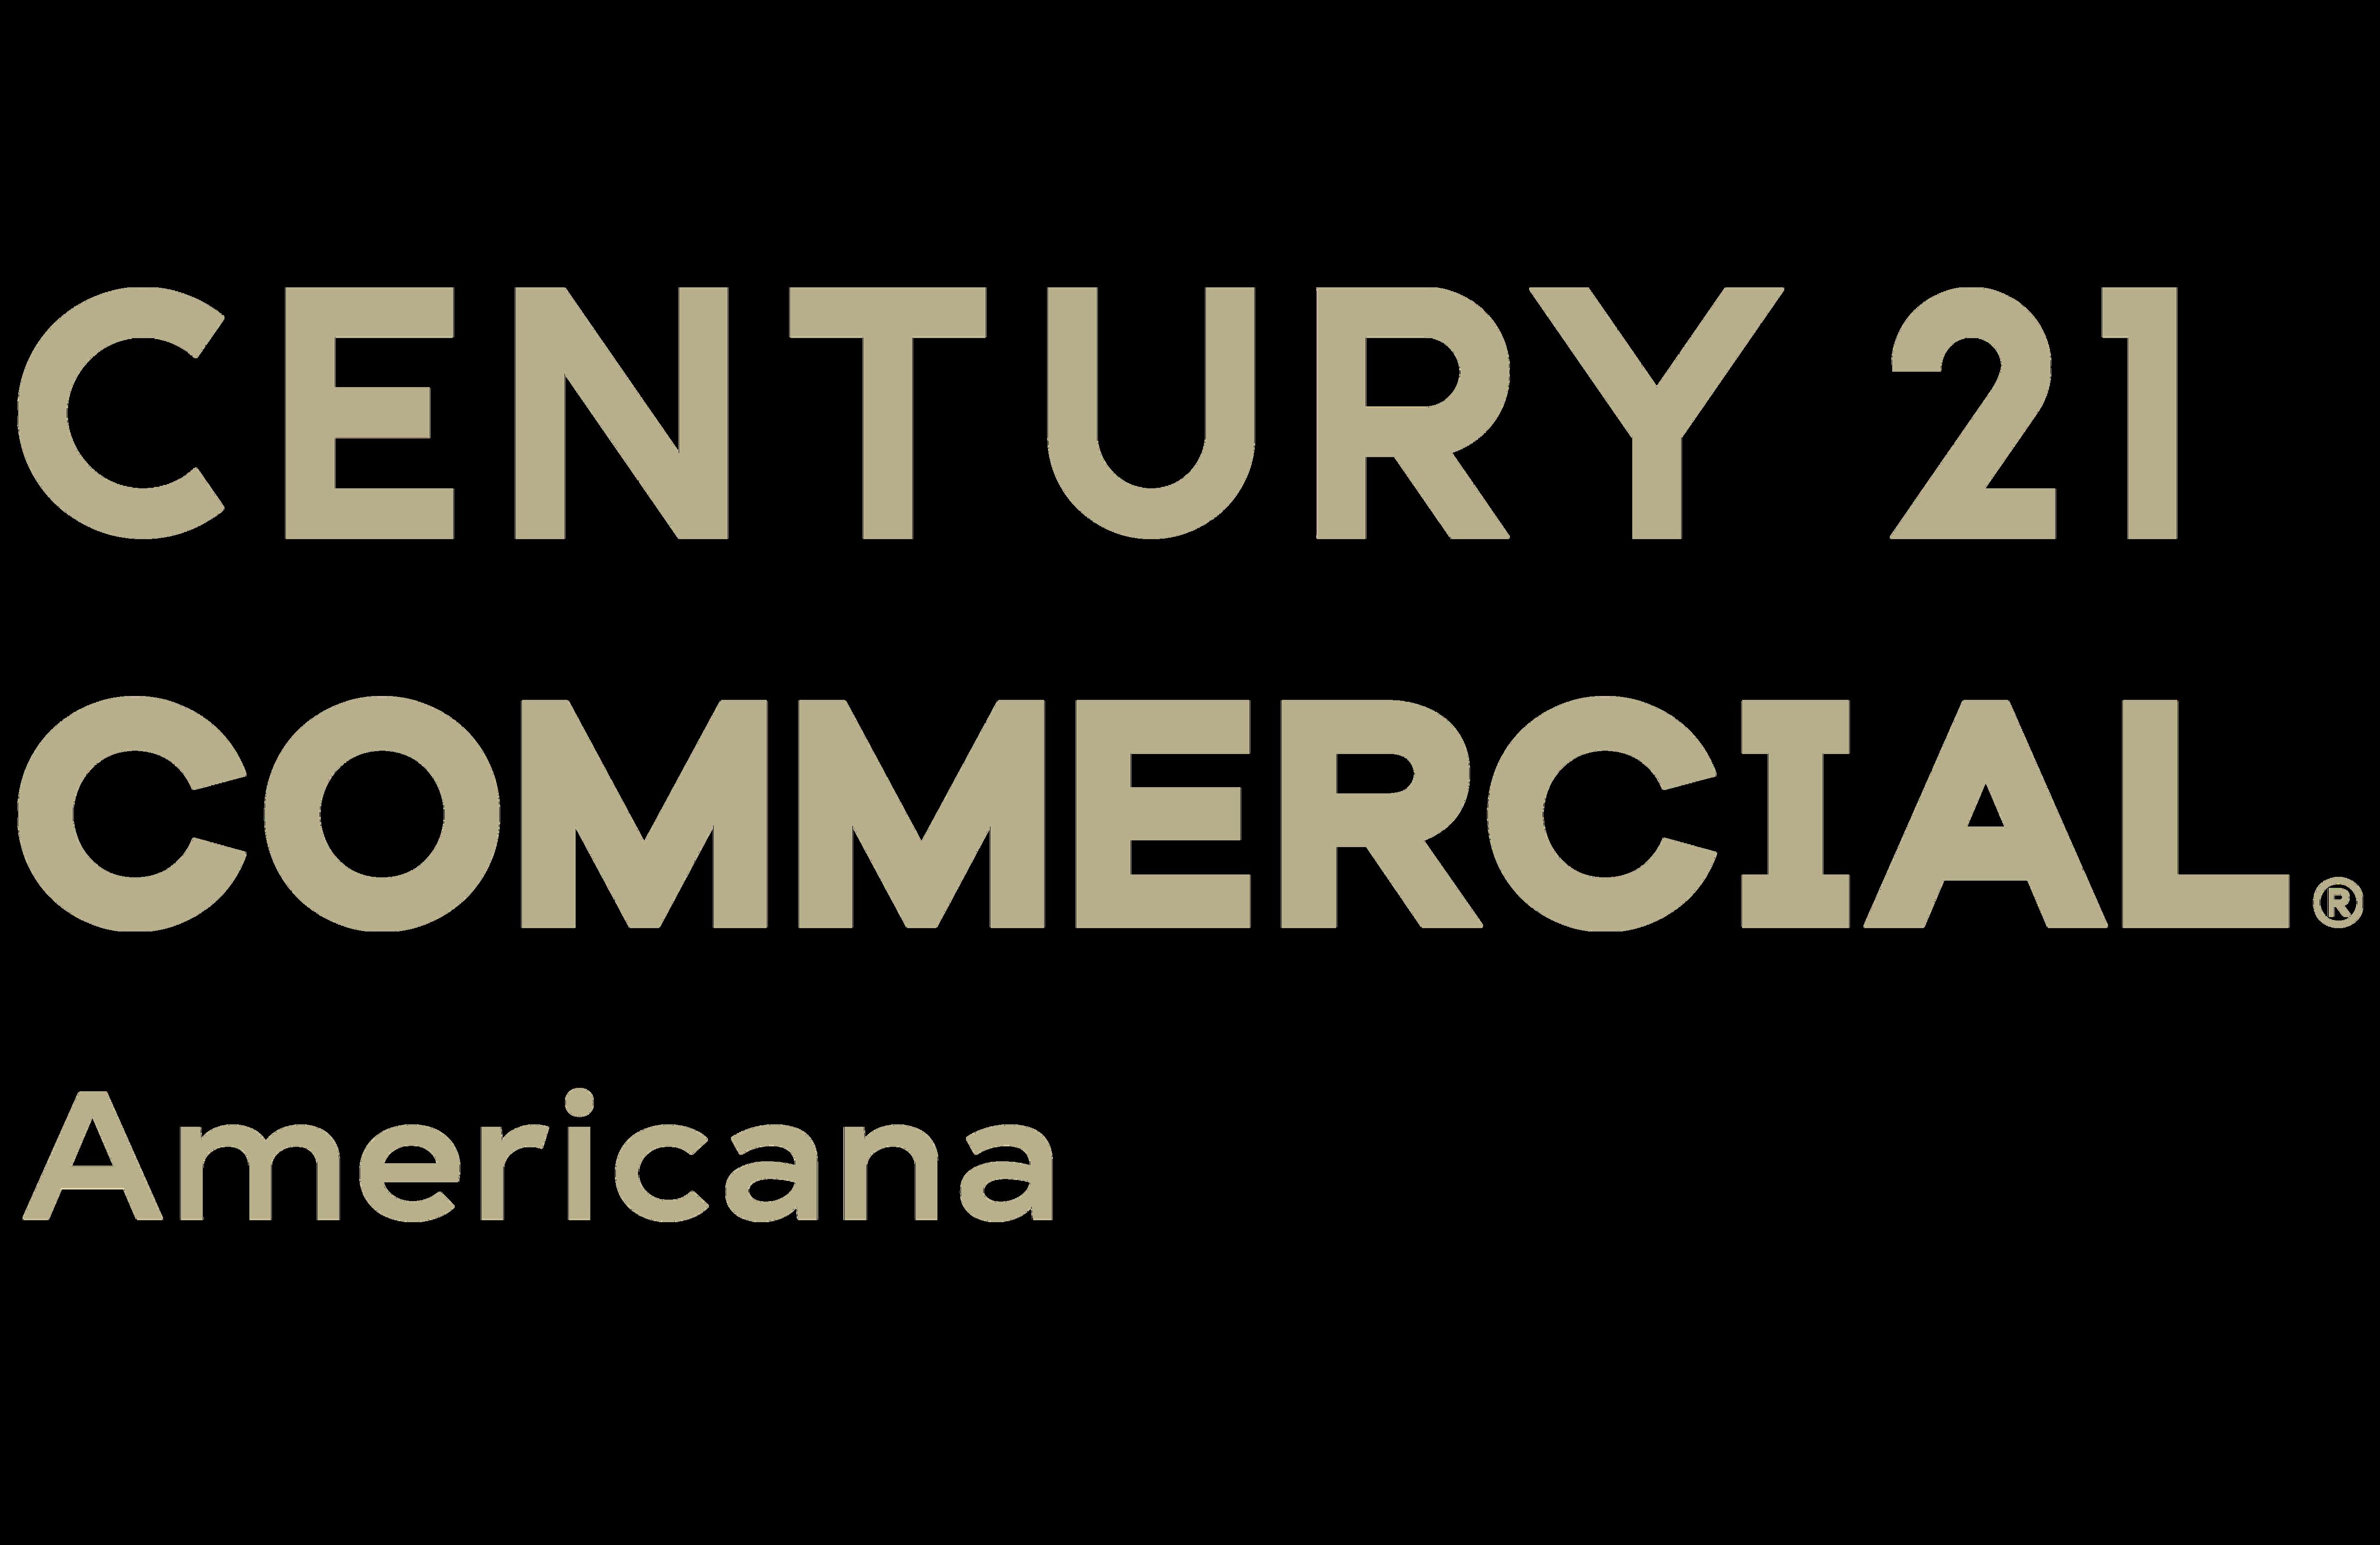 CENTURY 21 Americana